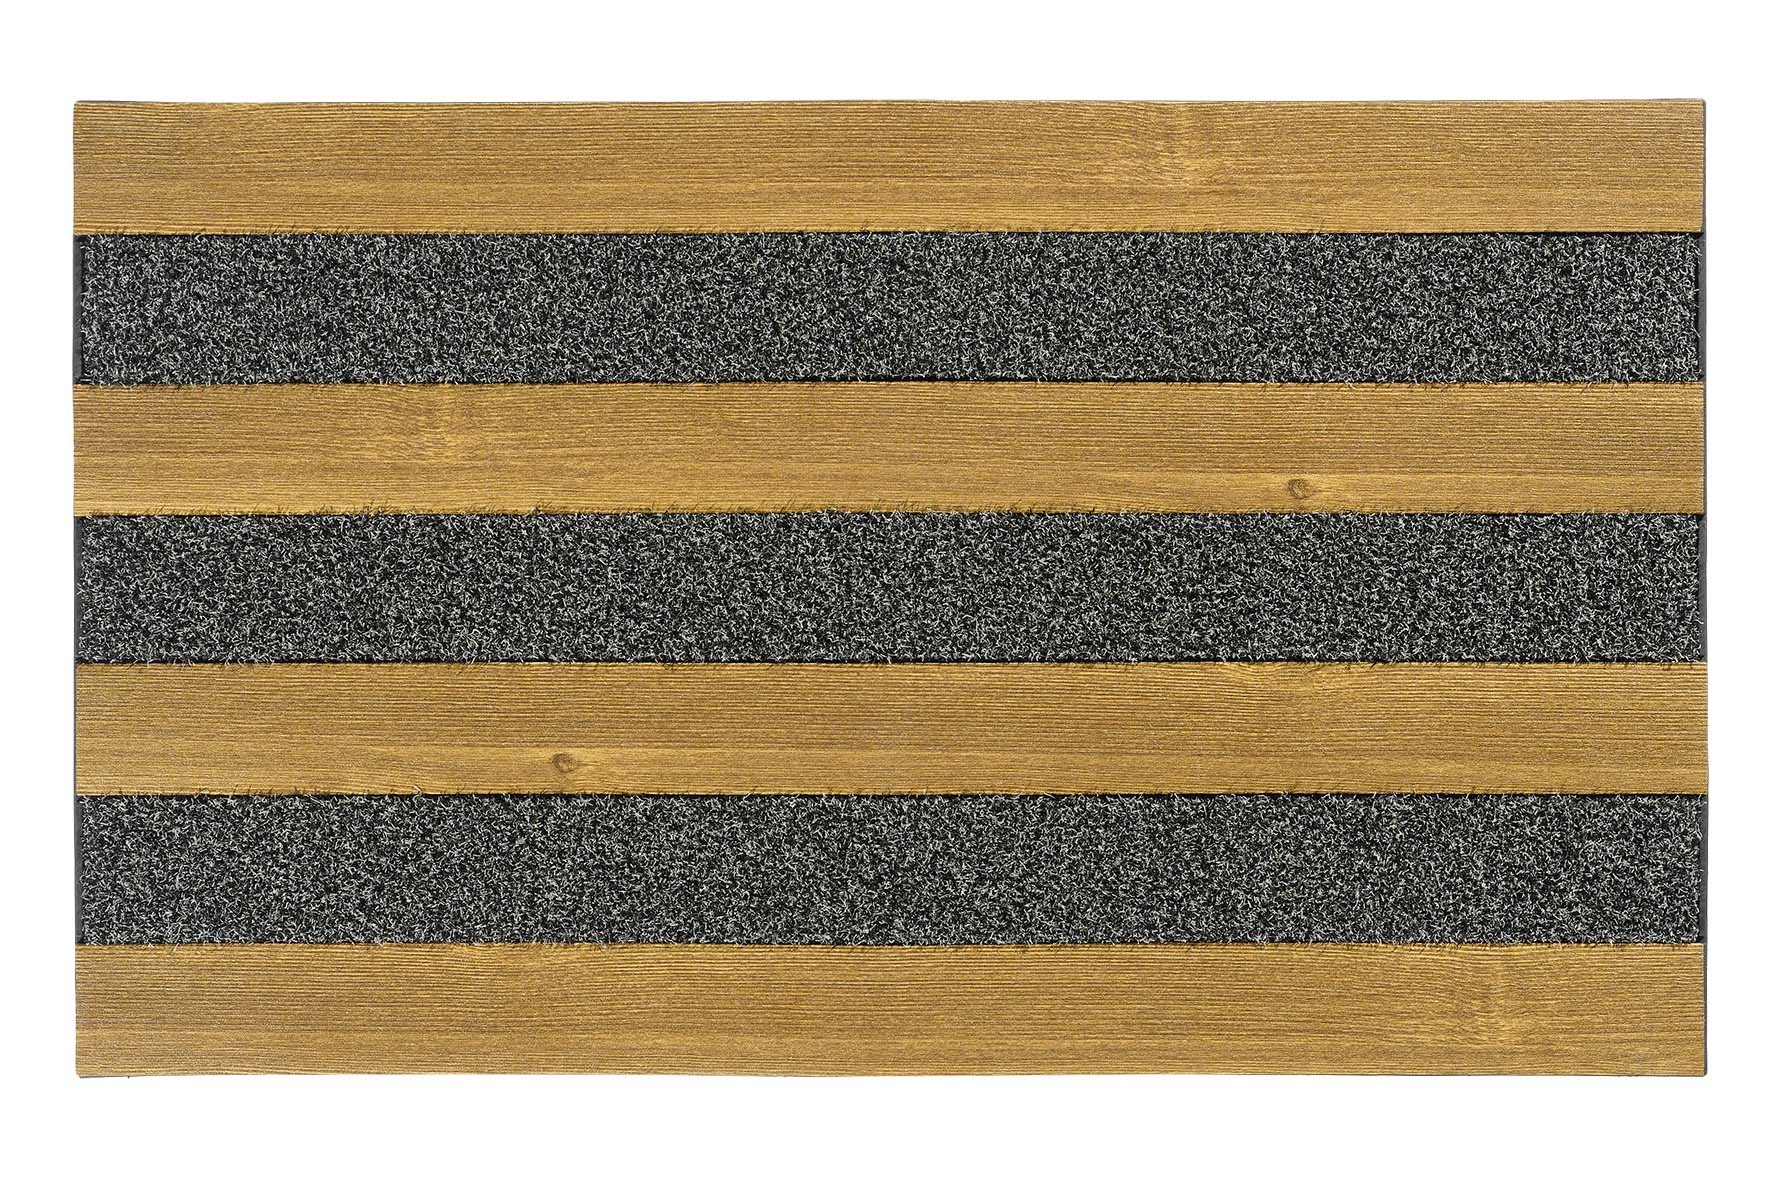 MD-Entree deurmatten Deurmat Woodland, afm. 46 x 76 cm - oak